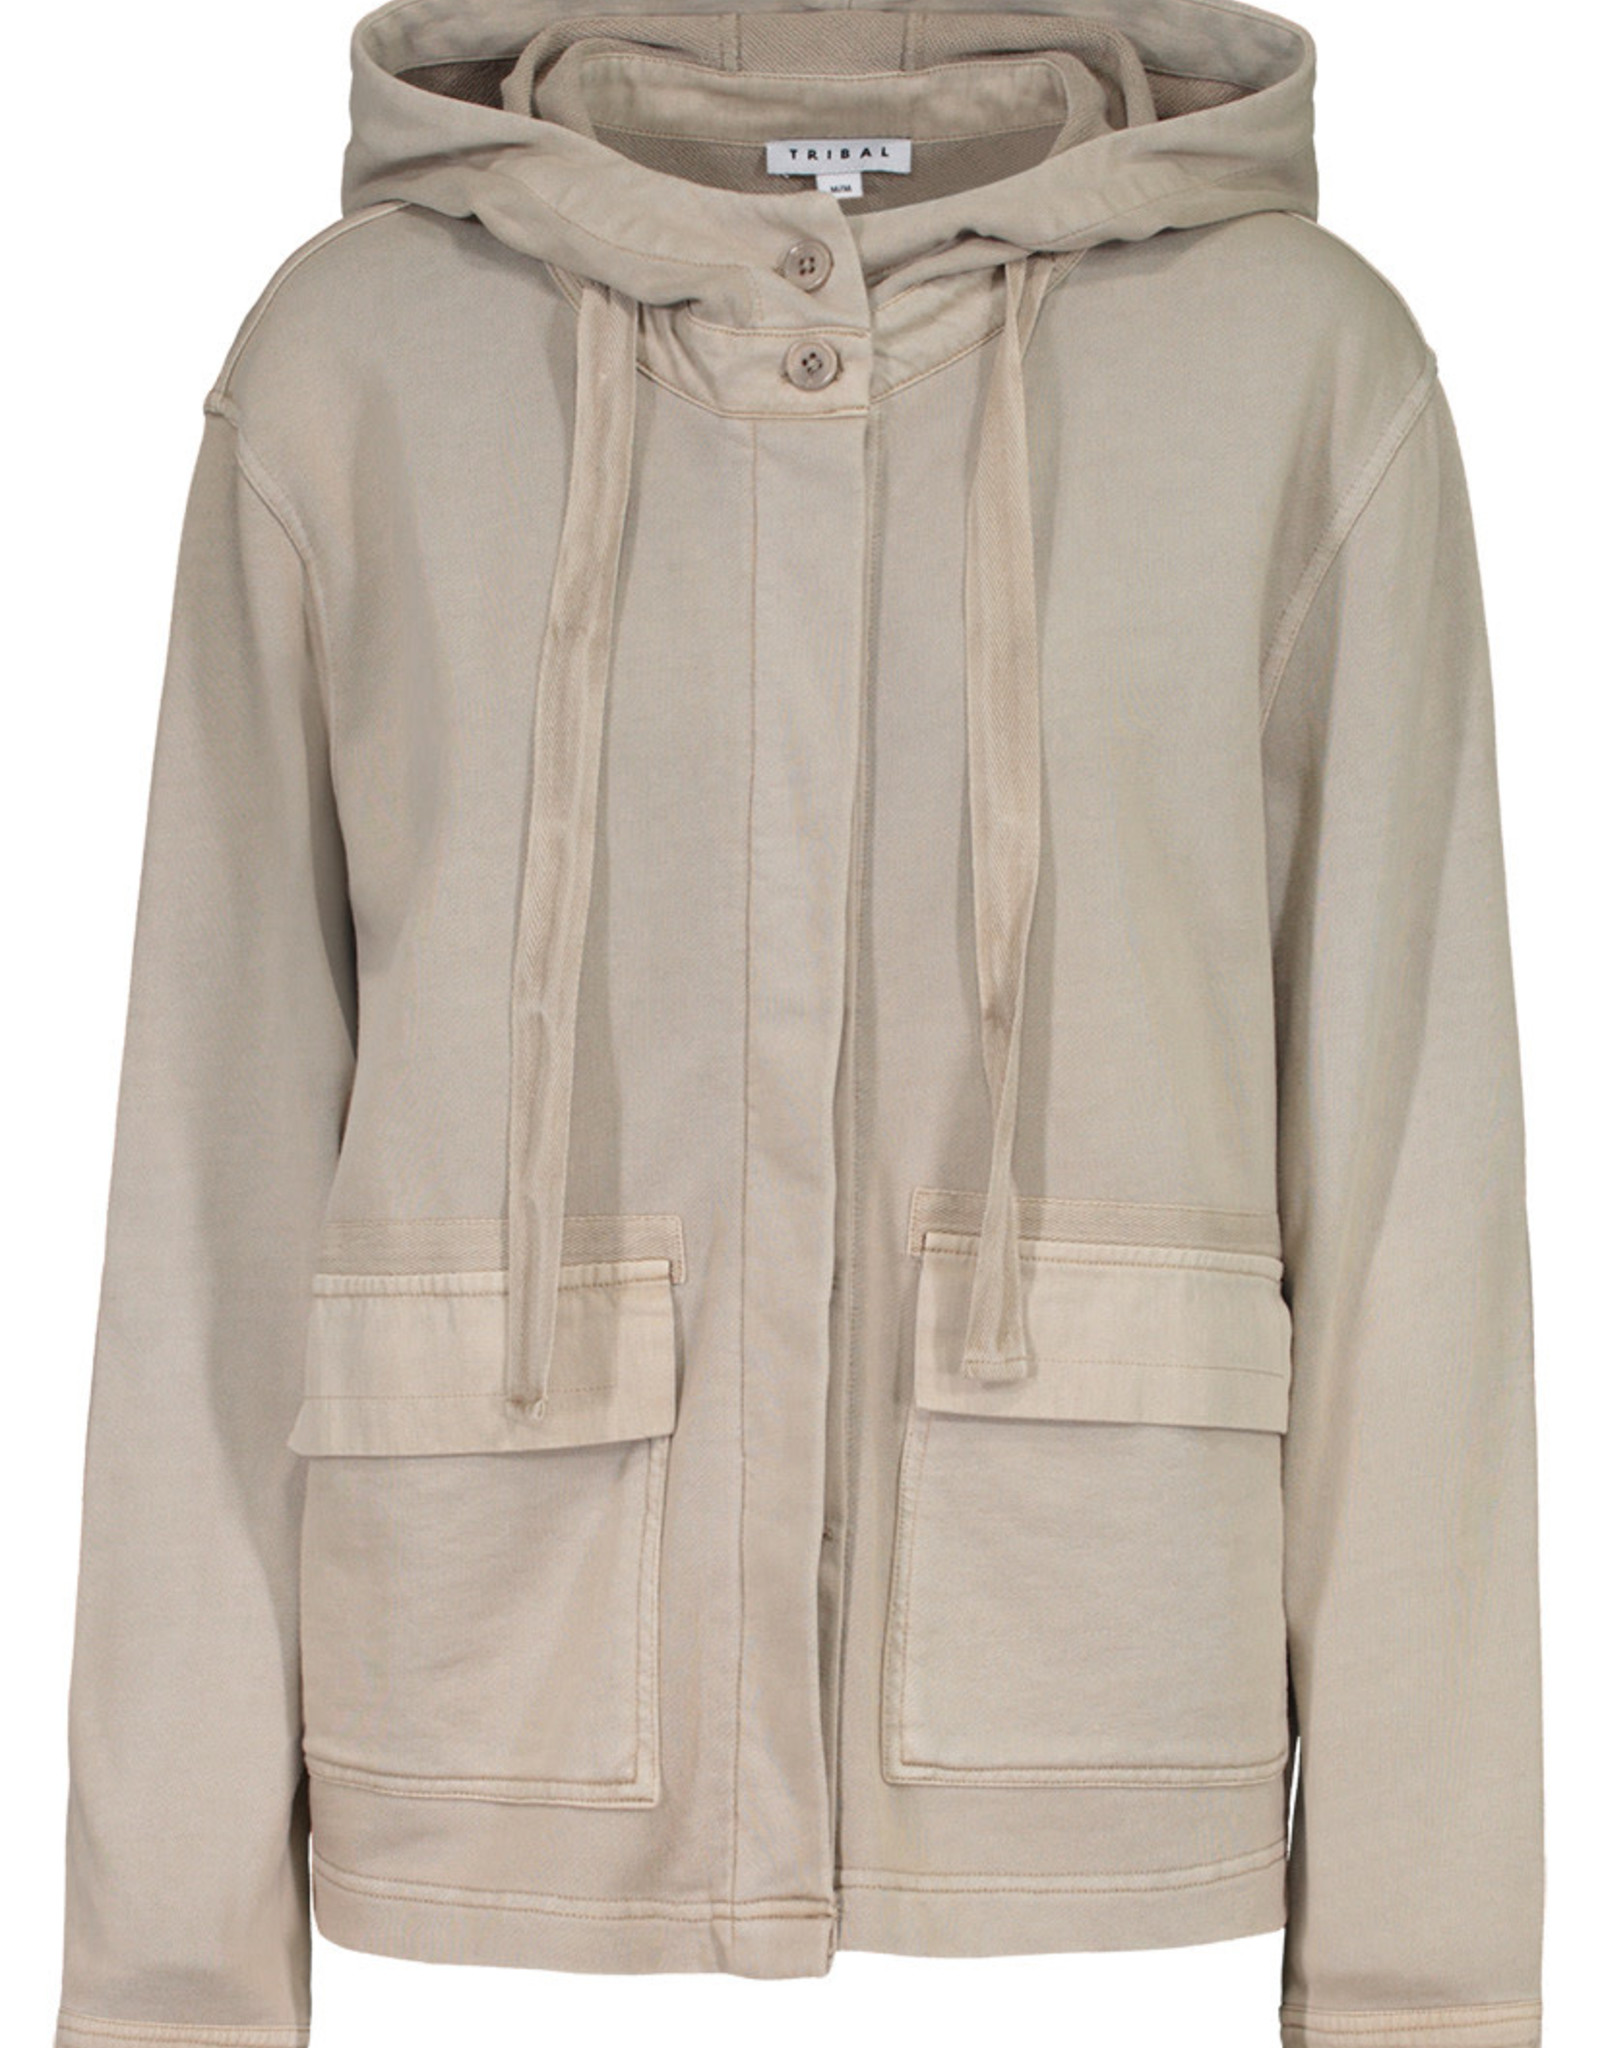 Tribal Khaki Hooded Jacket w/Pockets